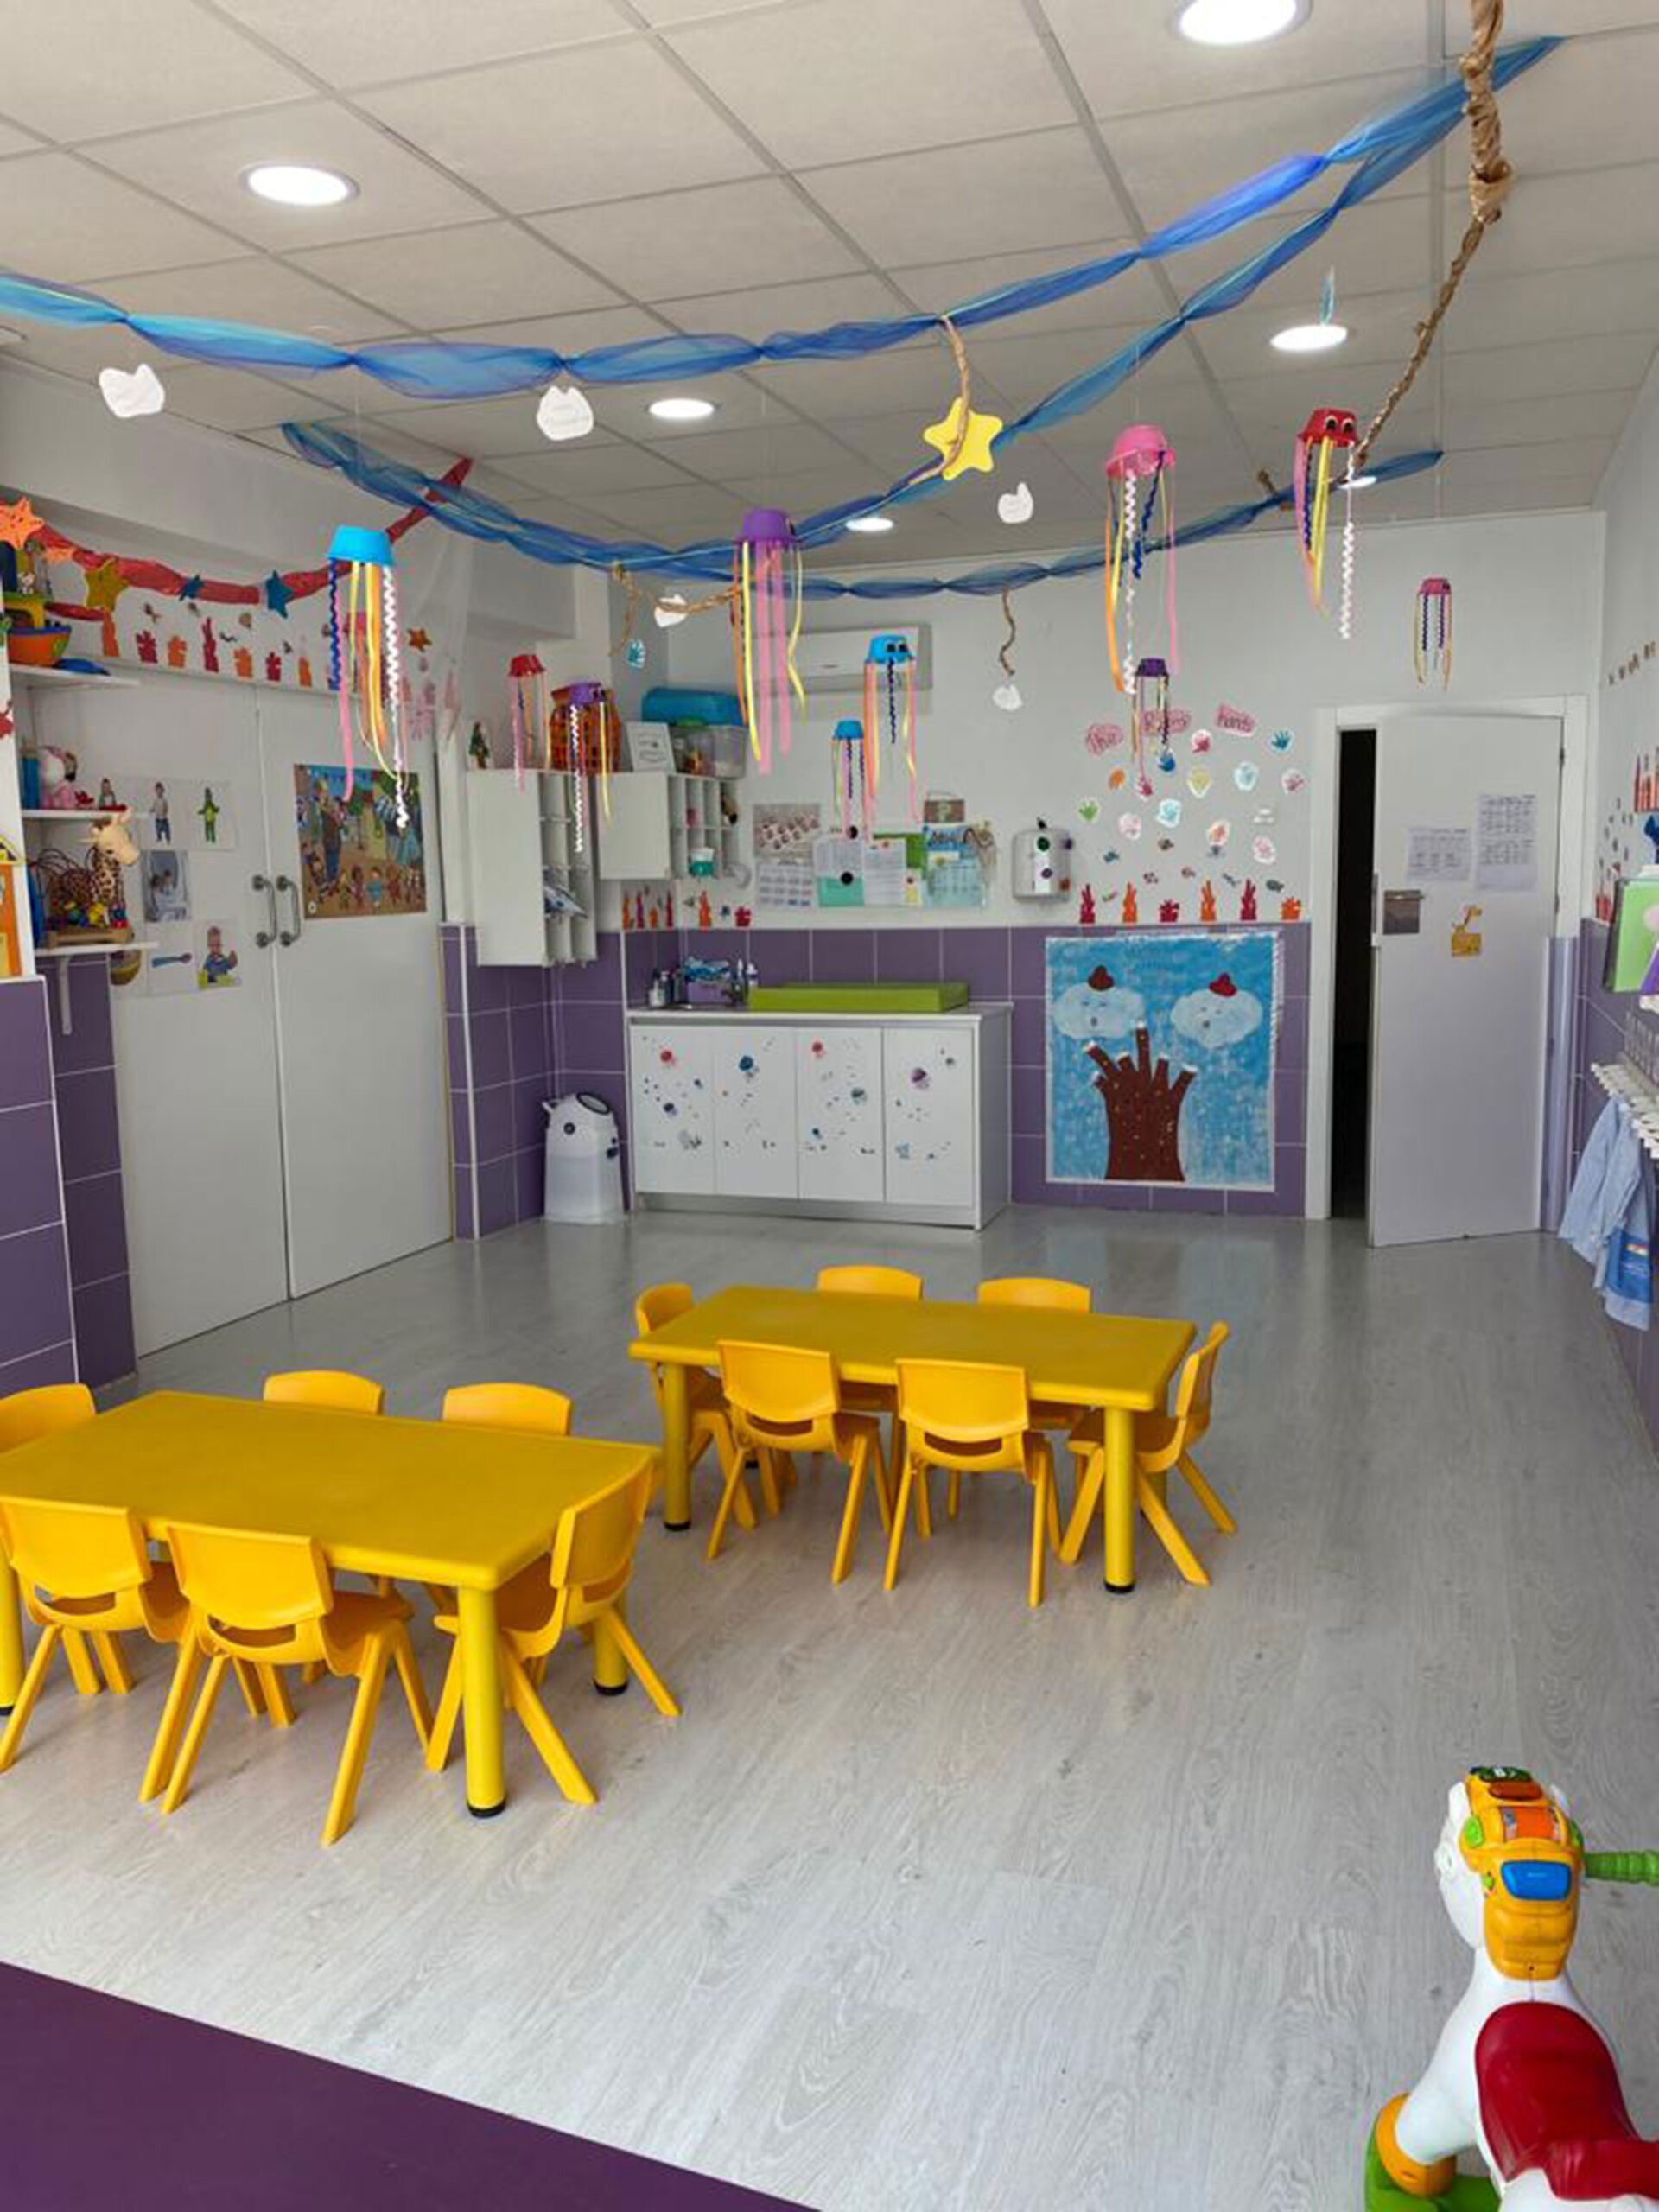 A CEI Bombonets classroom